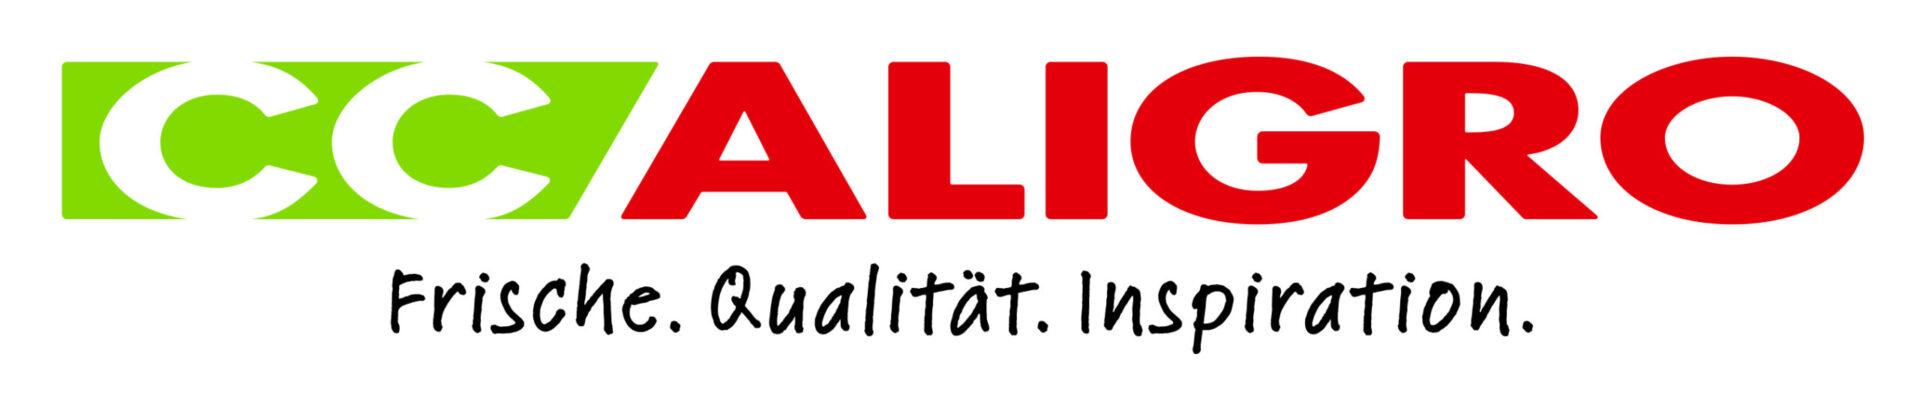 CCALIGRO Logo mit Claim, RGB